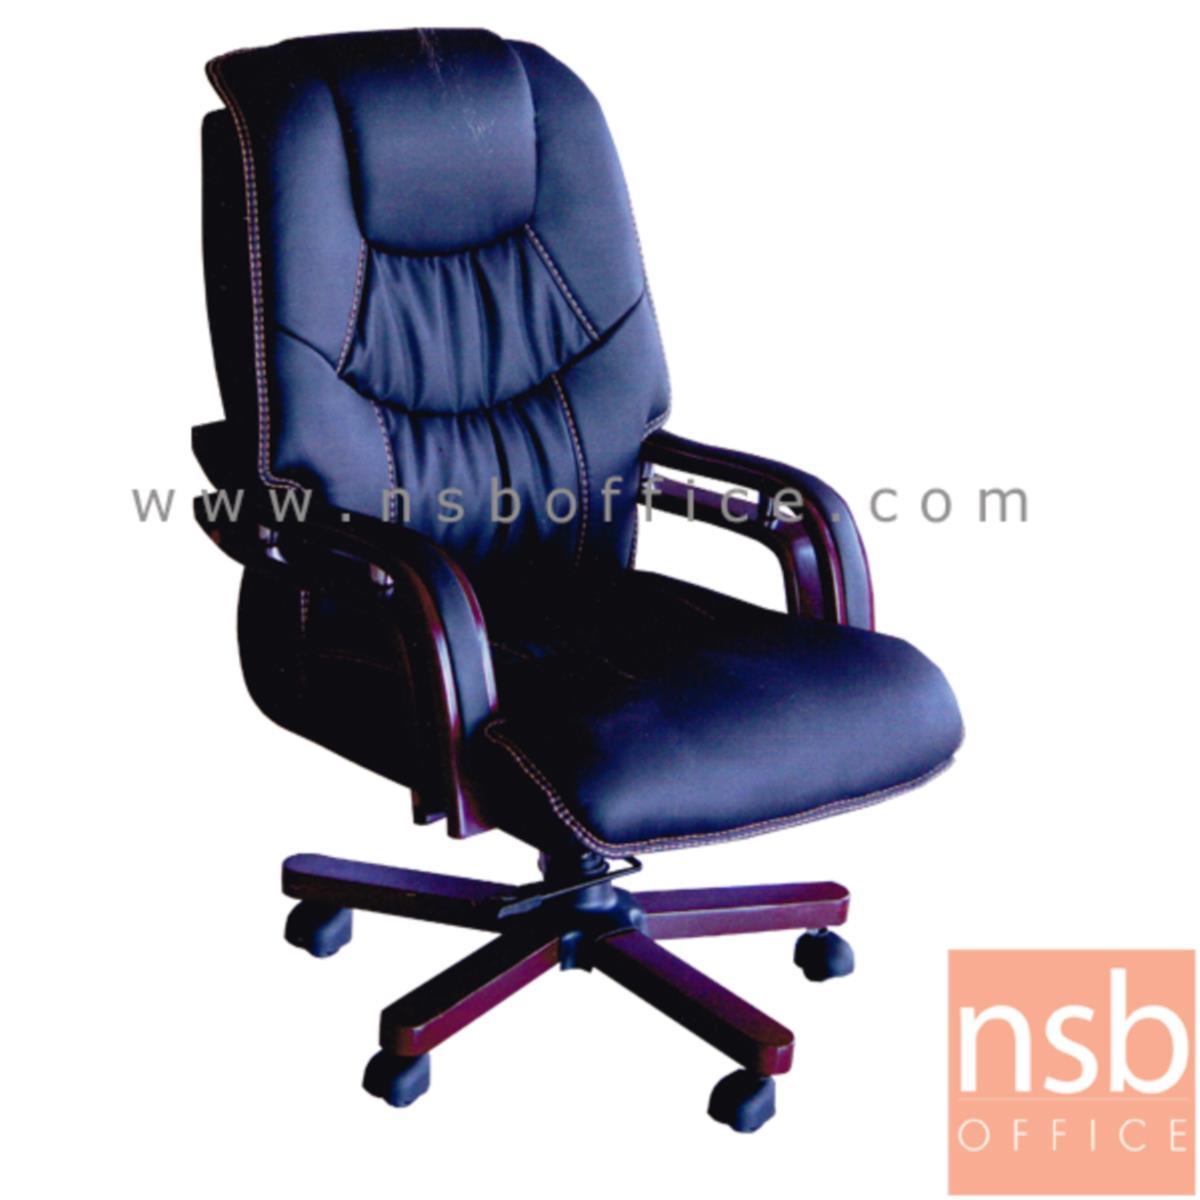 B25A077:เก้าอี้ผู้บริหารหนัง PU รุ่น Travolta (ทราโวลตา)  โช๊คแก๊ส มีก้อนโยก ขาไม้